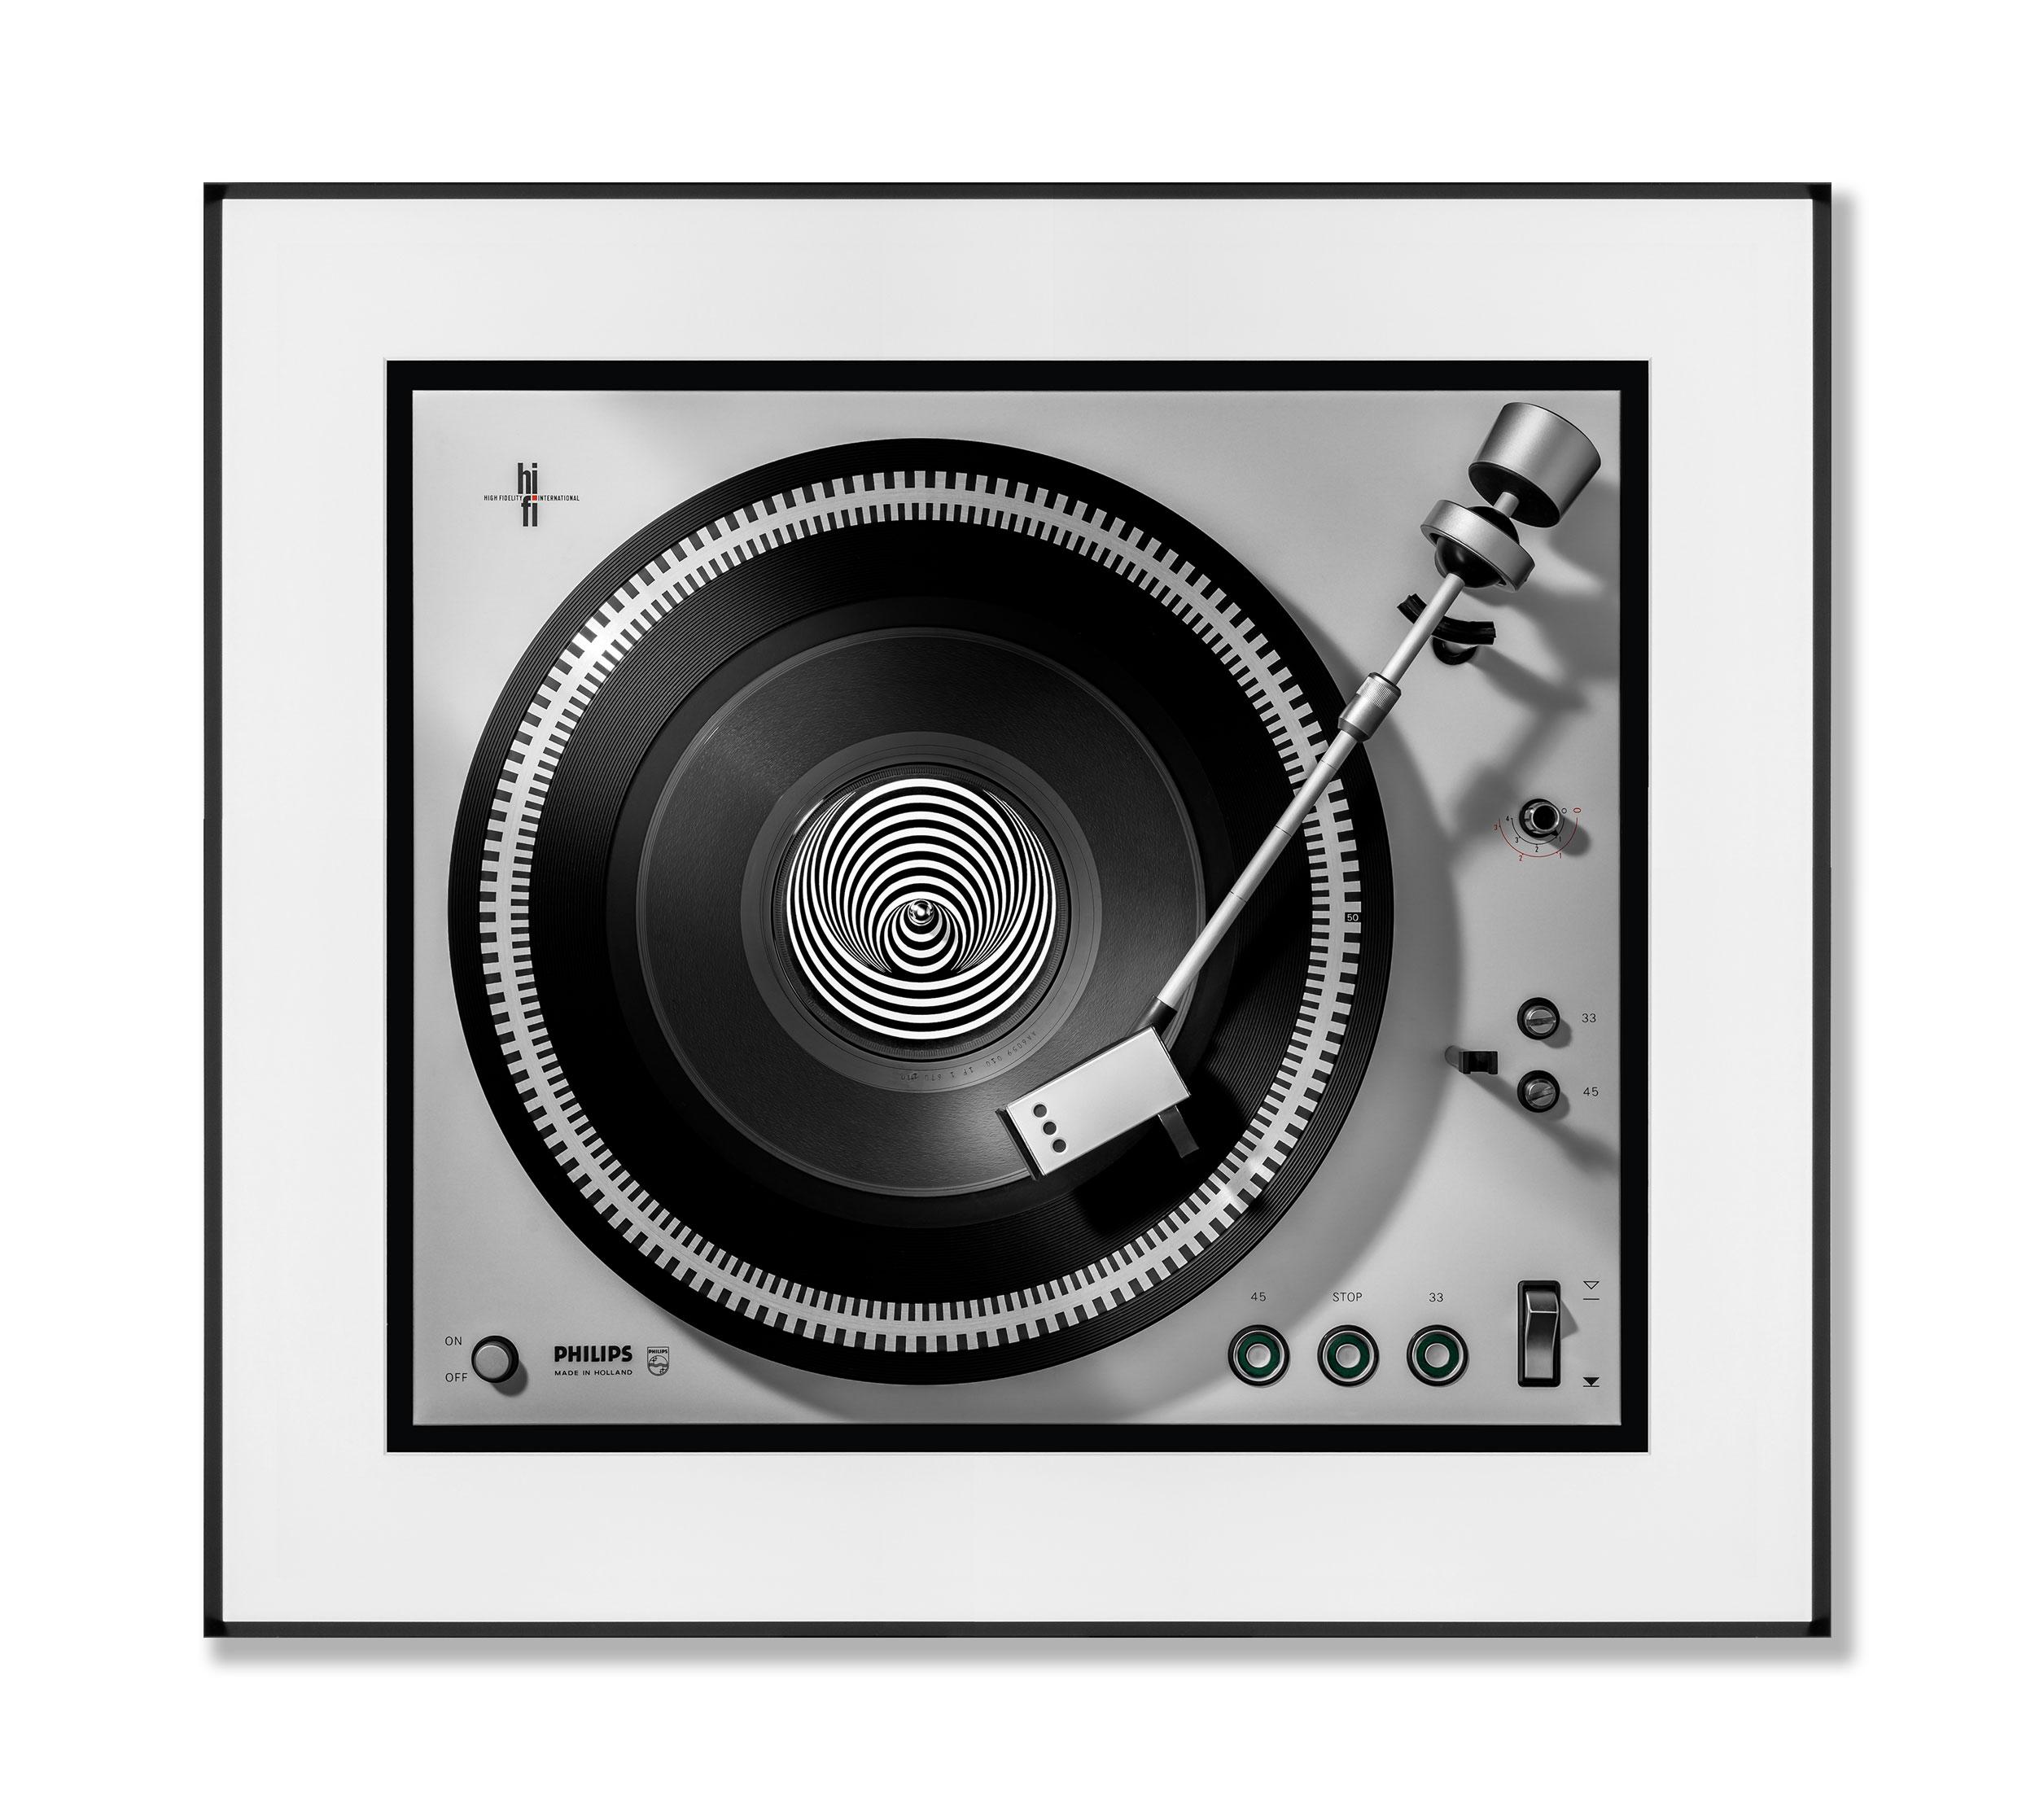 Vinylography No. 6 Black Sabbath Paranoid on Philips